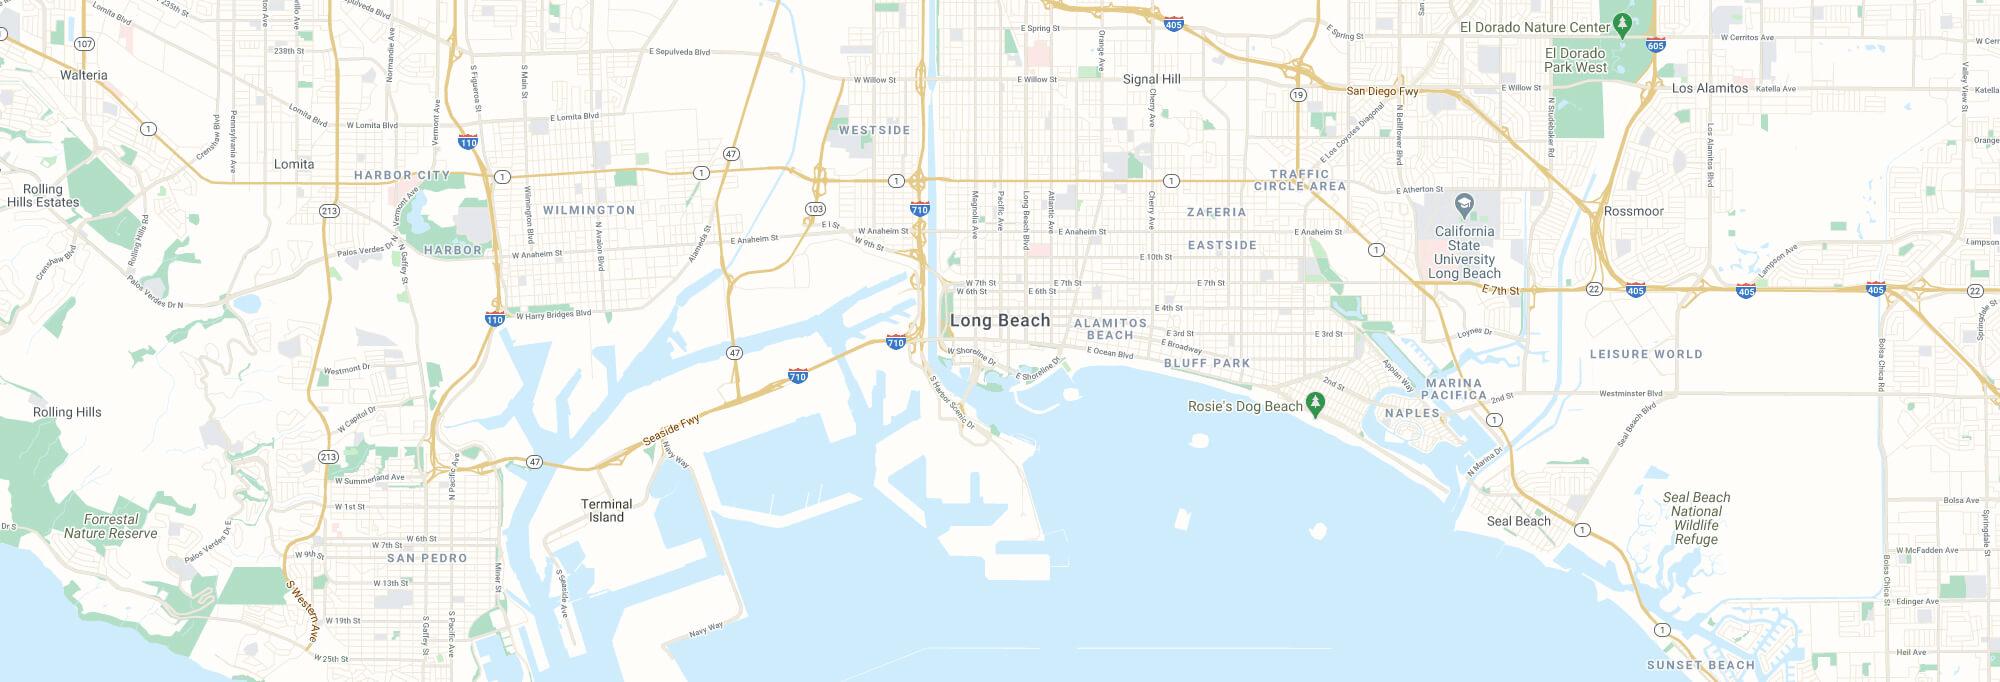 Long Beach city map